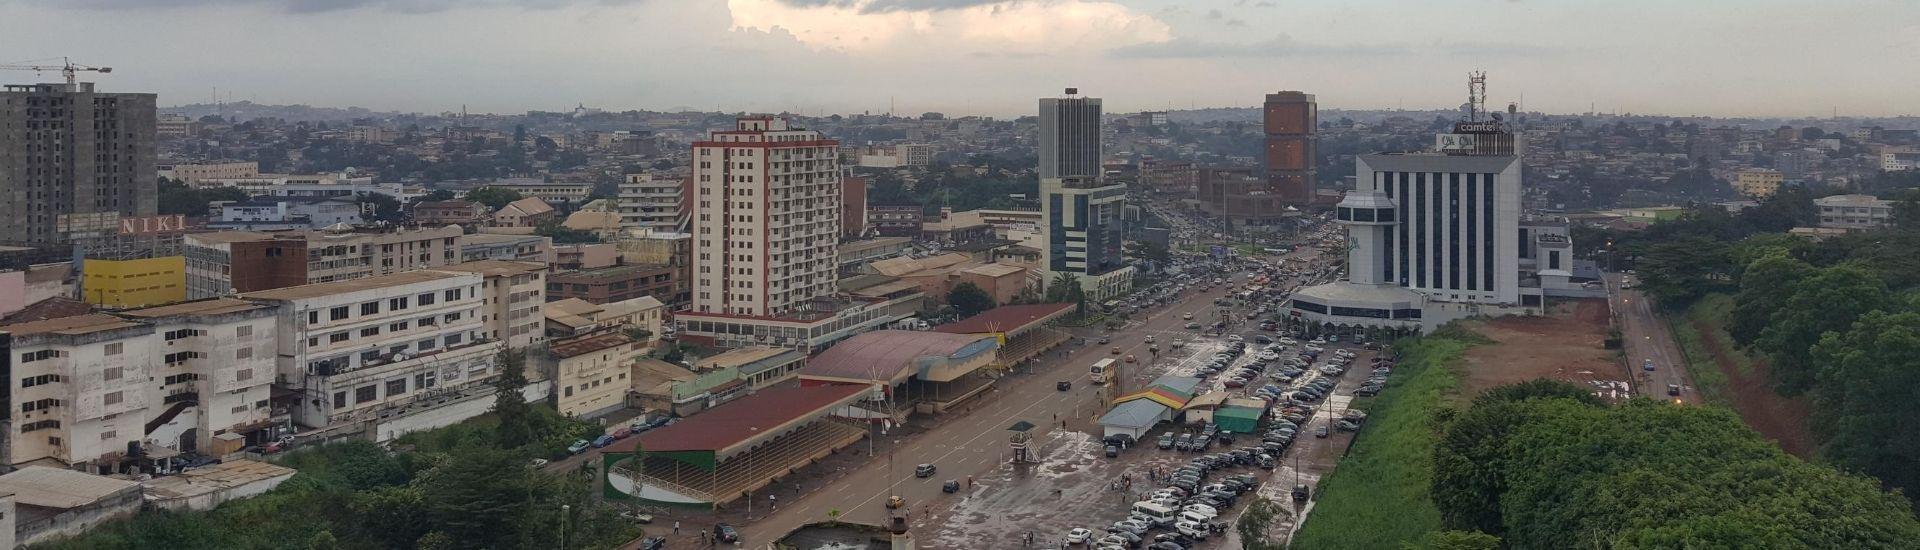 Ongola Ewondo (Yaoundé) Kolo Beti